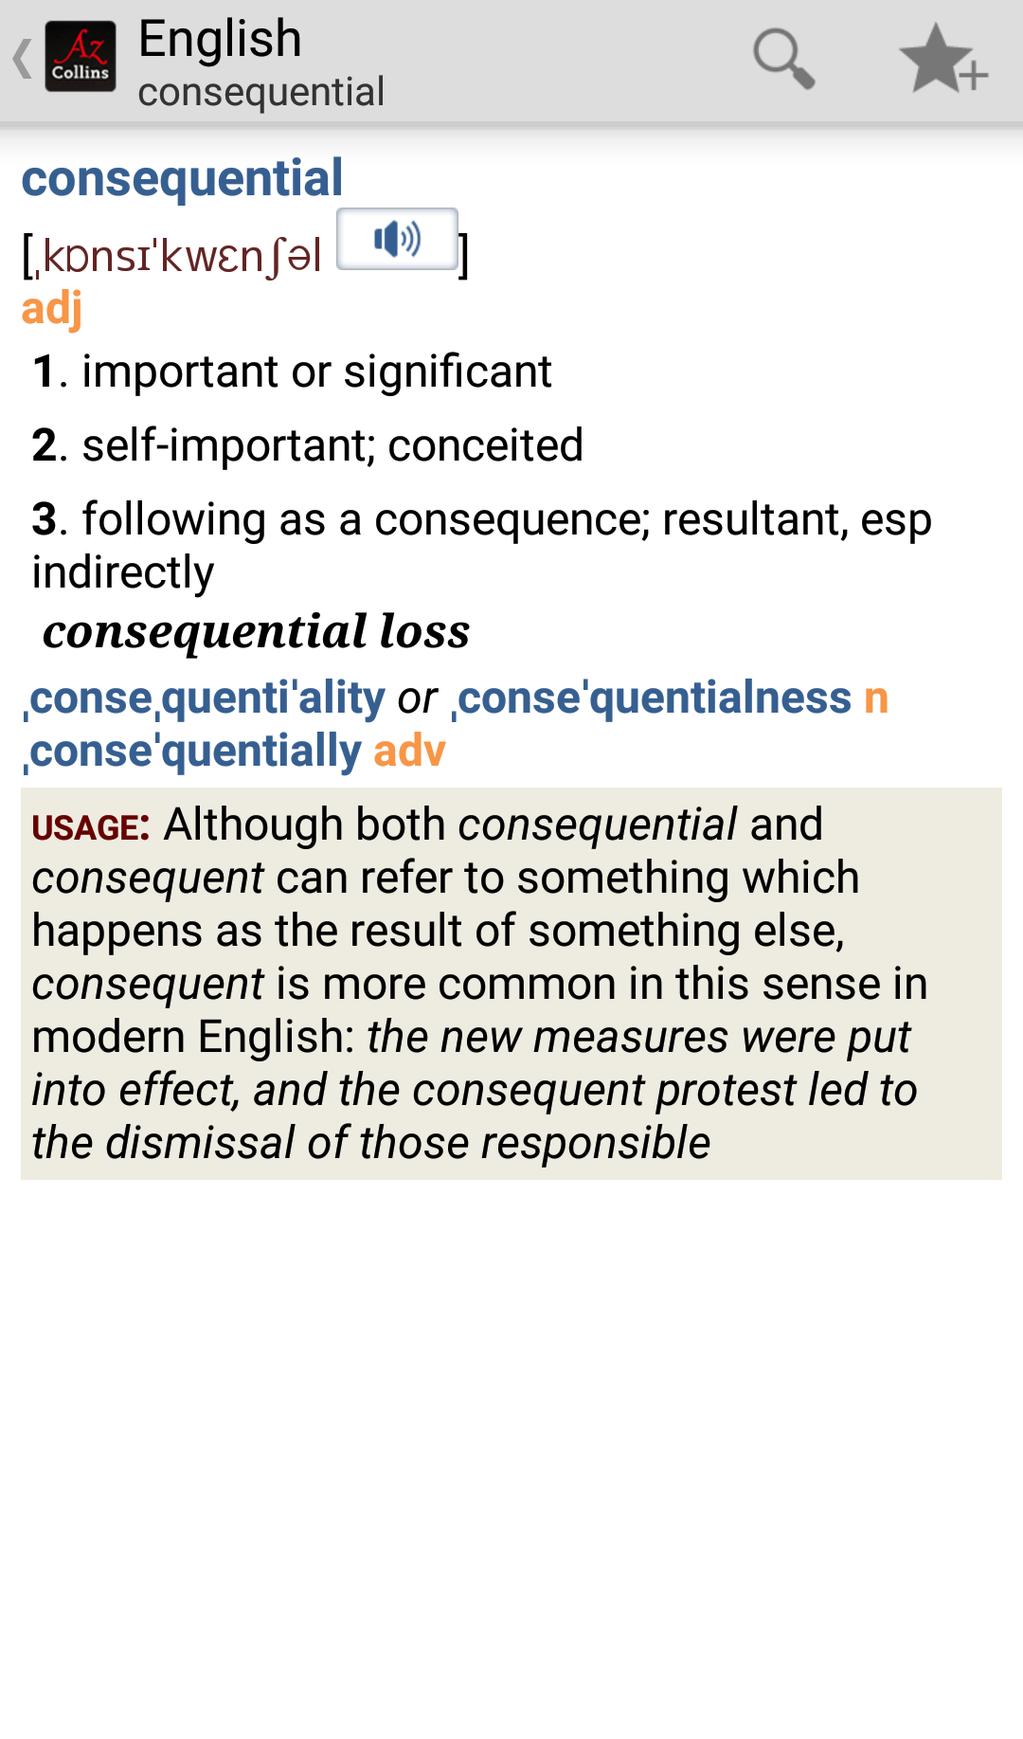 Collins English Dictionary Complete & Unabridged Screenshot 10